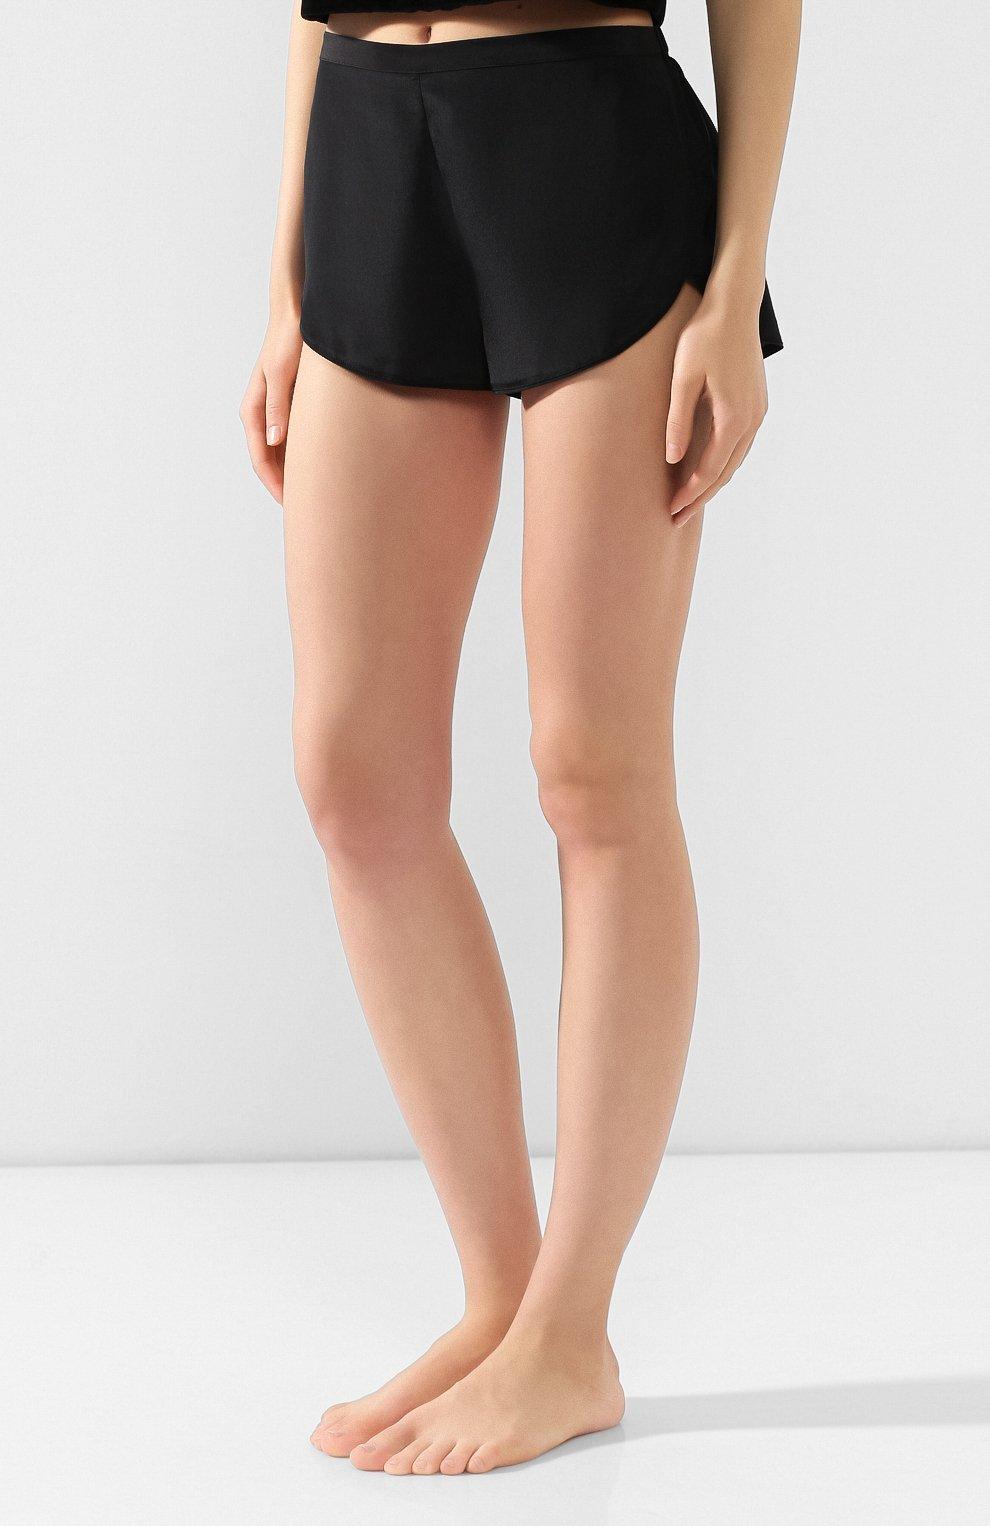 Женские шорты CHANTAL THOMASS черного цвета, арт. TA17_чер | Фото 3